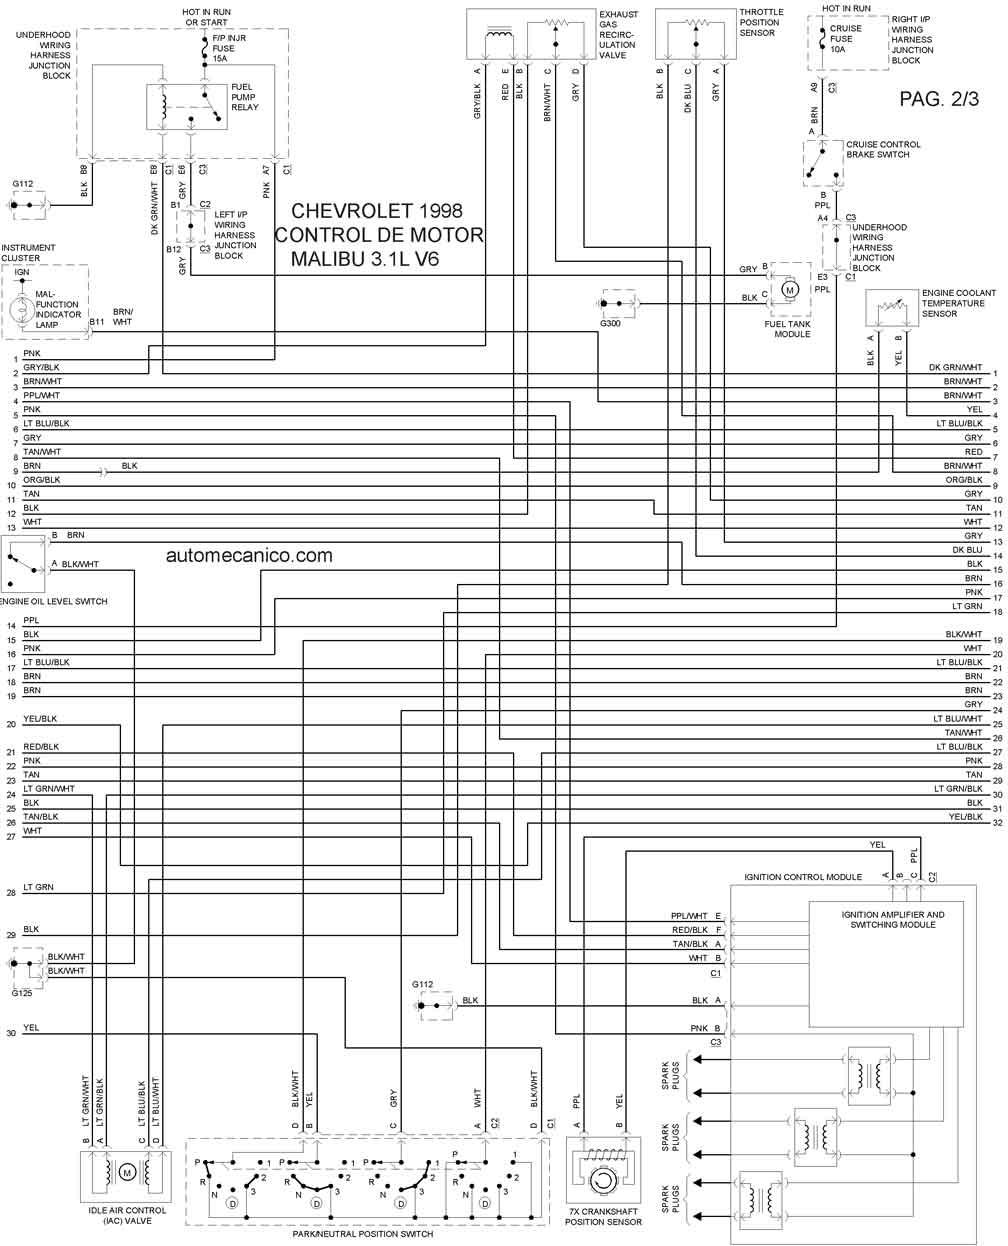 nissan patrol 4 2 wiring diagram chevrolet 1998 diagramas esquemas graphics